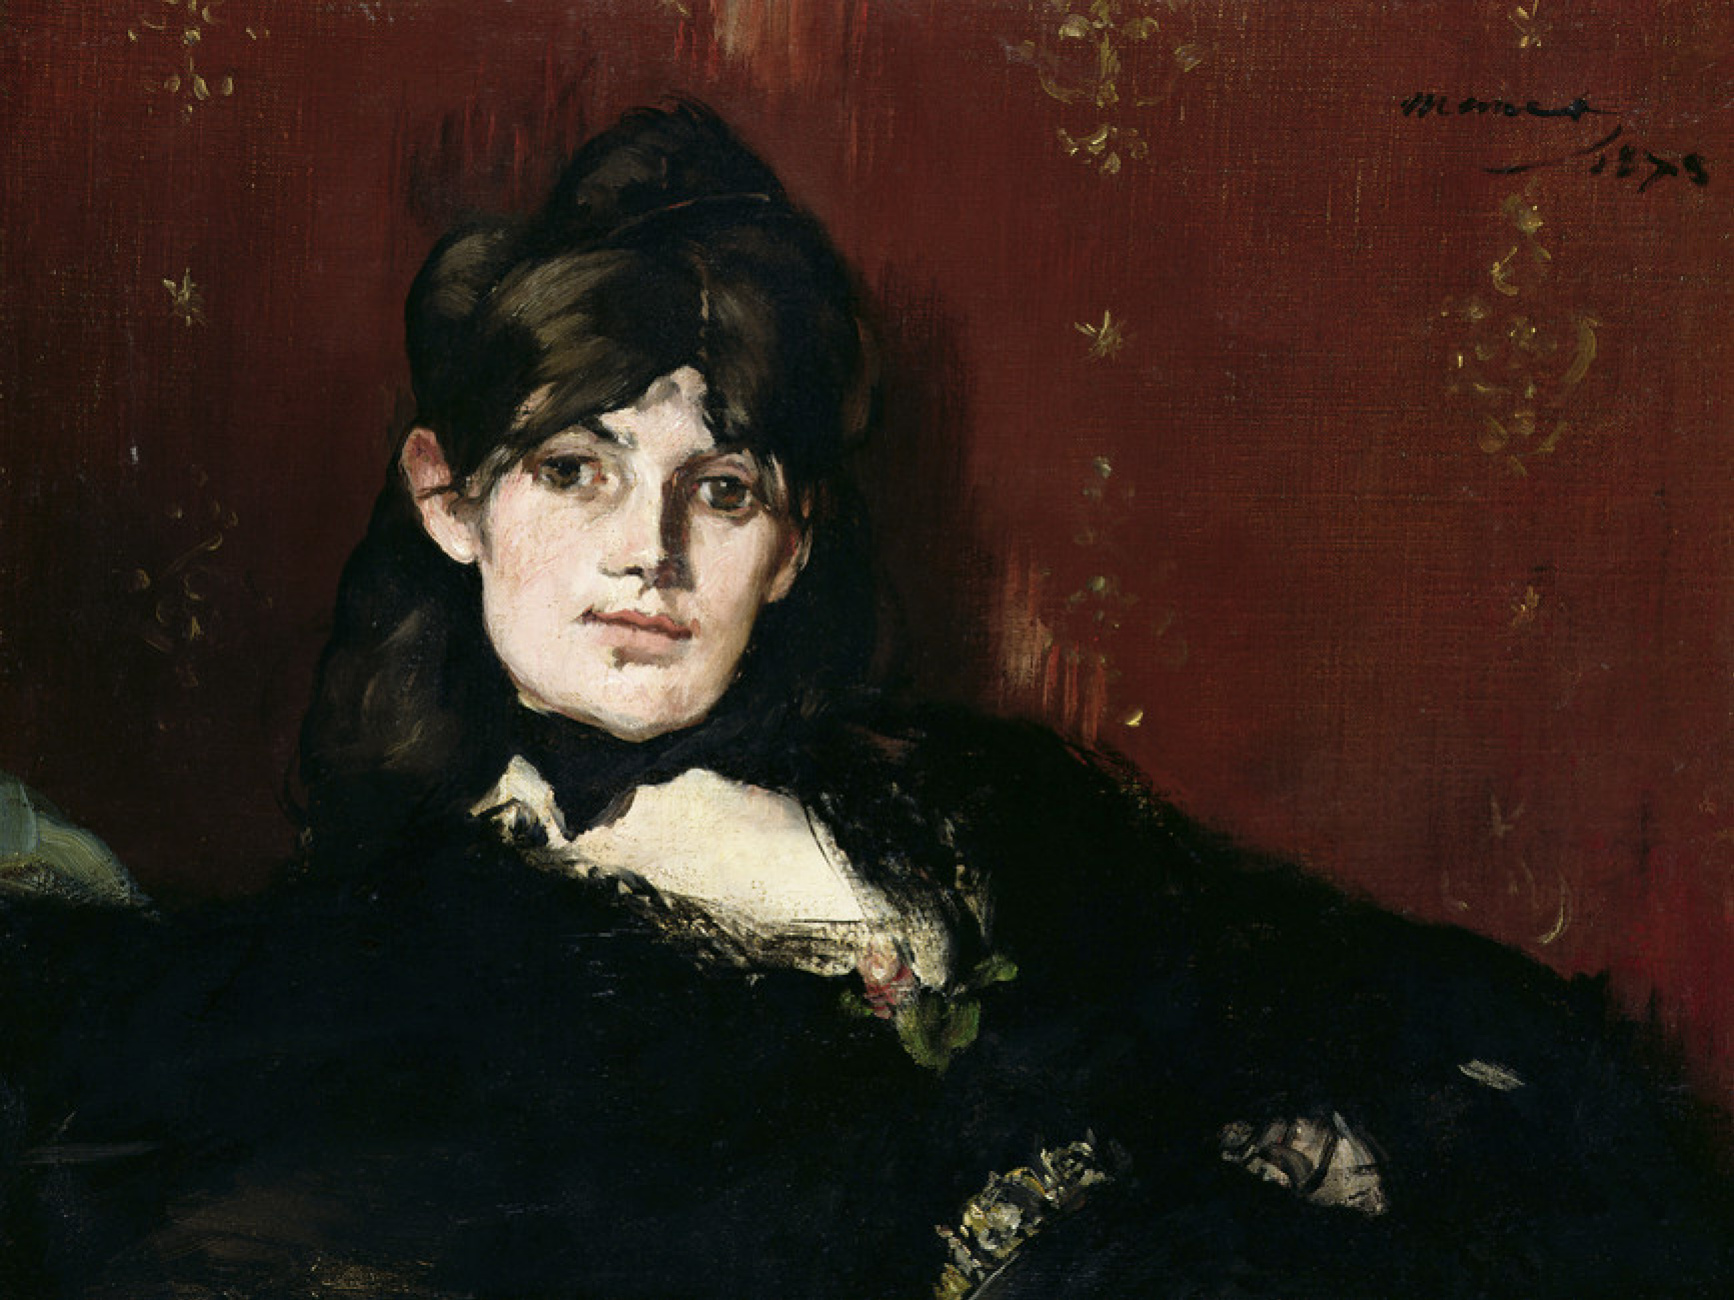 Edouard Manet. Portrait of Berthe Morisot